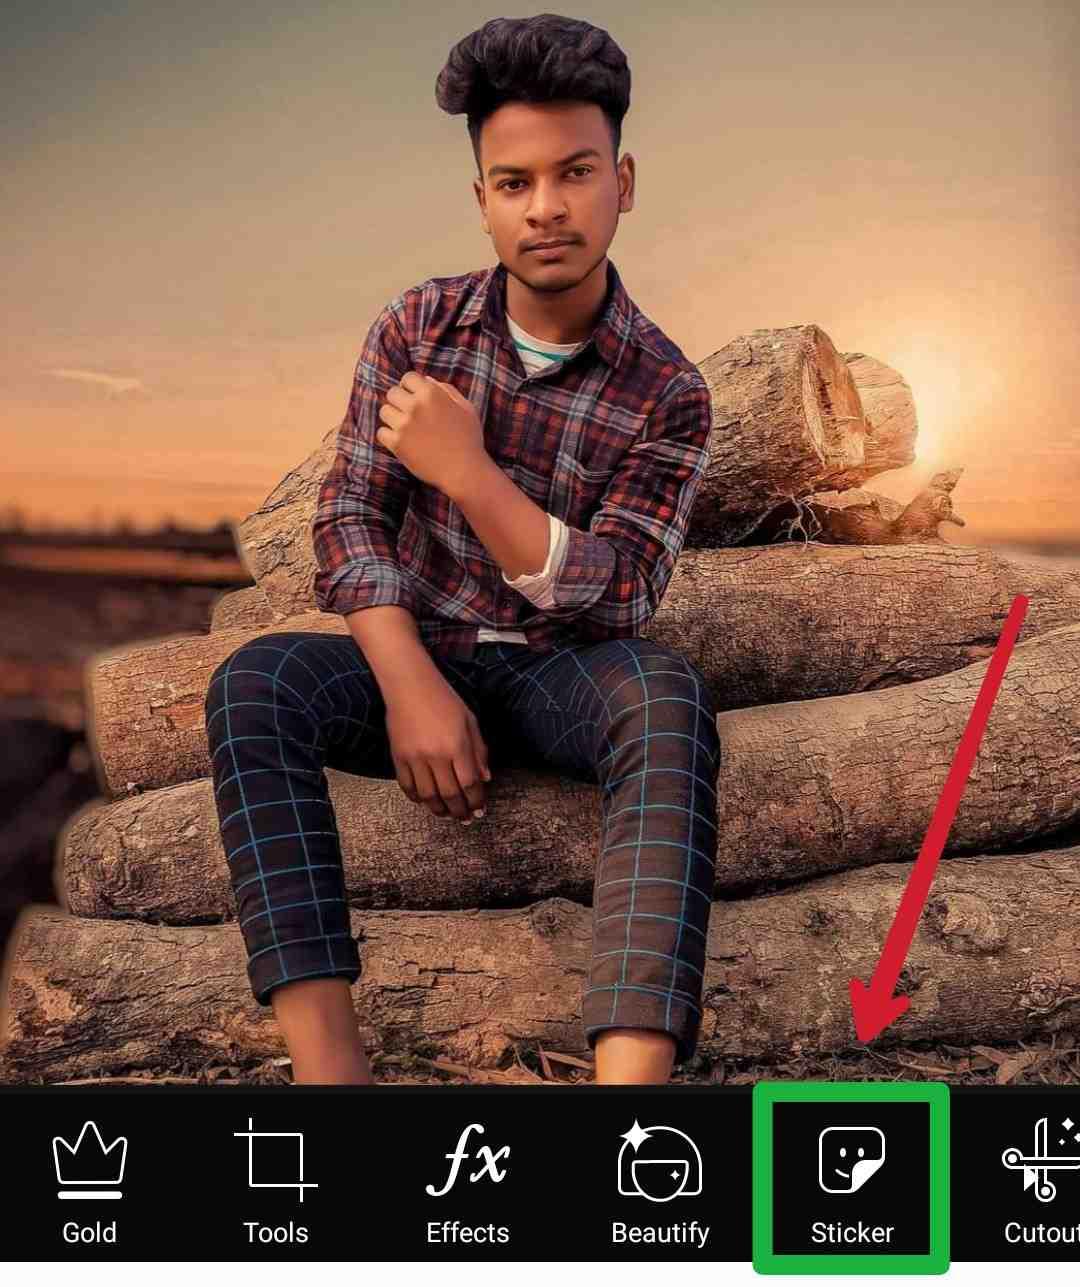 Picsart দিয়ে ছবি ইডিট করার জন্য প্রয়োজনীয় PNG ইমেজ পাবেন যেভাবে। | PNG Download For Picsart. png background png background hd png background full hd 1080p a png logo a png image png i love you png i miss you png এর পূর্ণরূপ কি